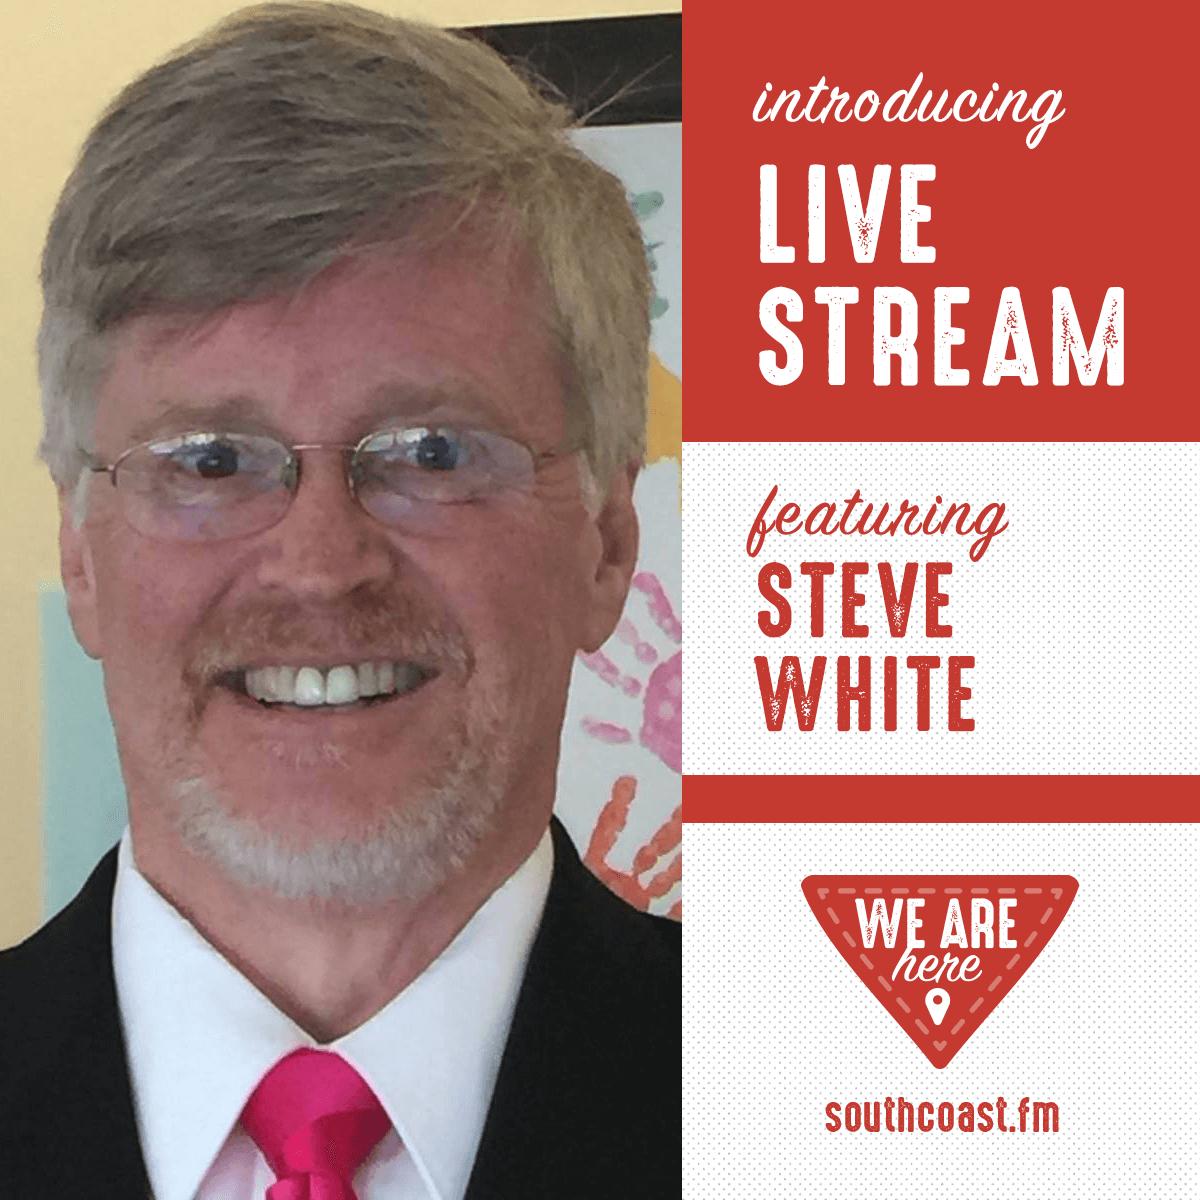 Steve White UMass Dartmouth We Are Here podcast